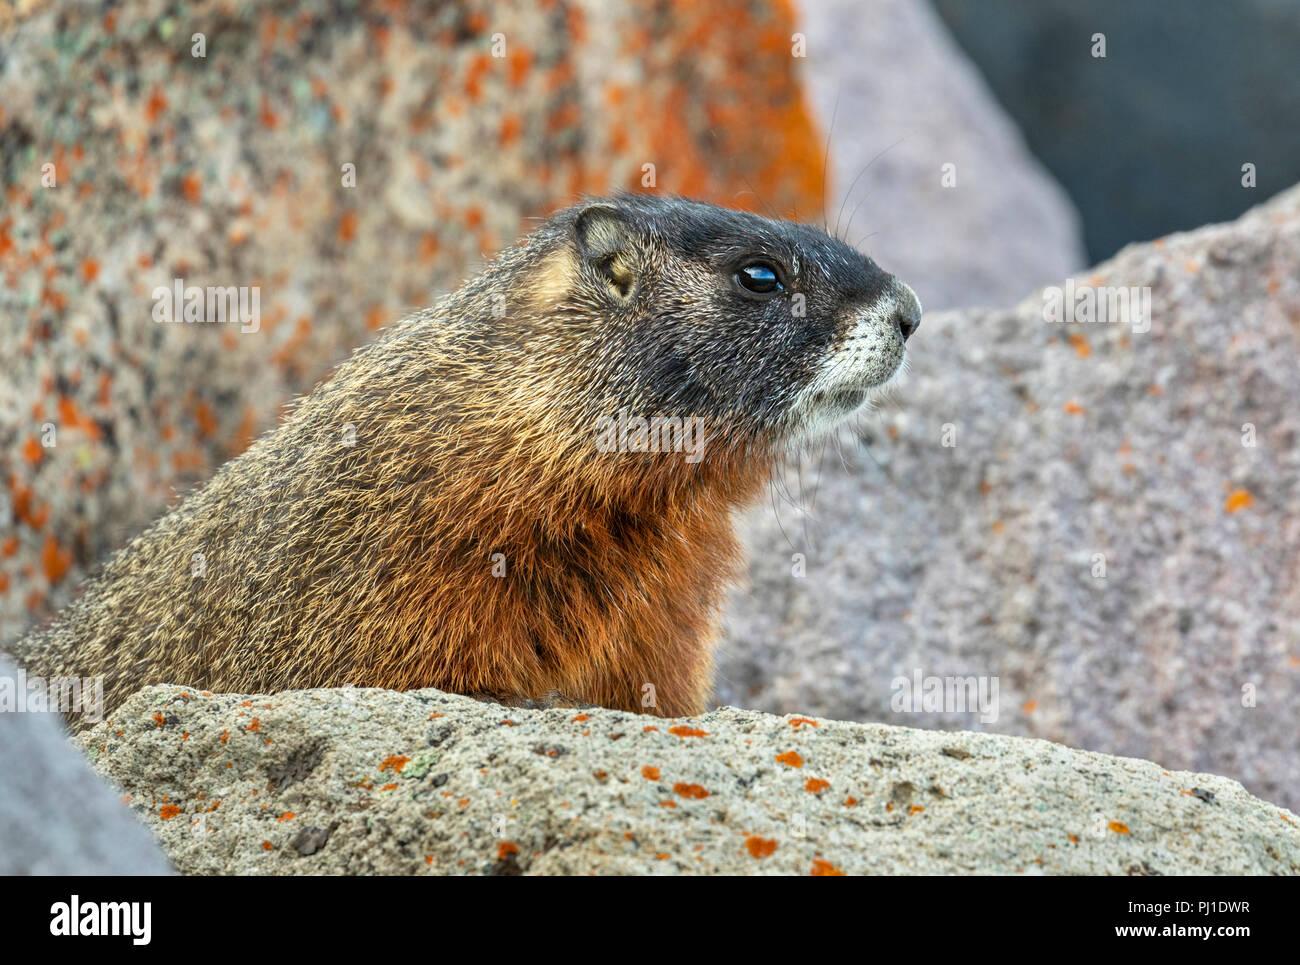 Yellow-bellied marmot (Marmota flaviventris) in rocky habitat, Yellowstone National Park, Wyoming, USA - Stock Image